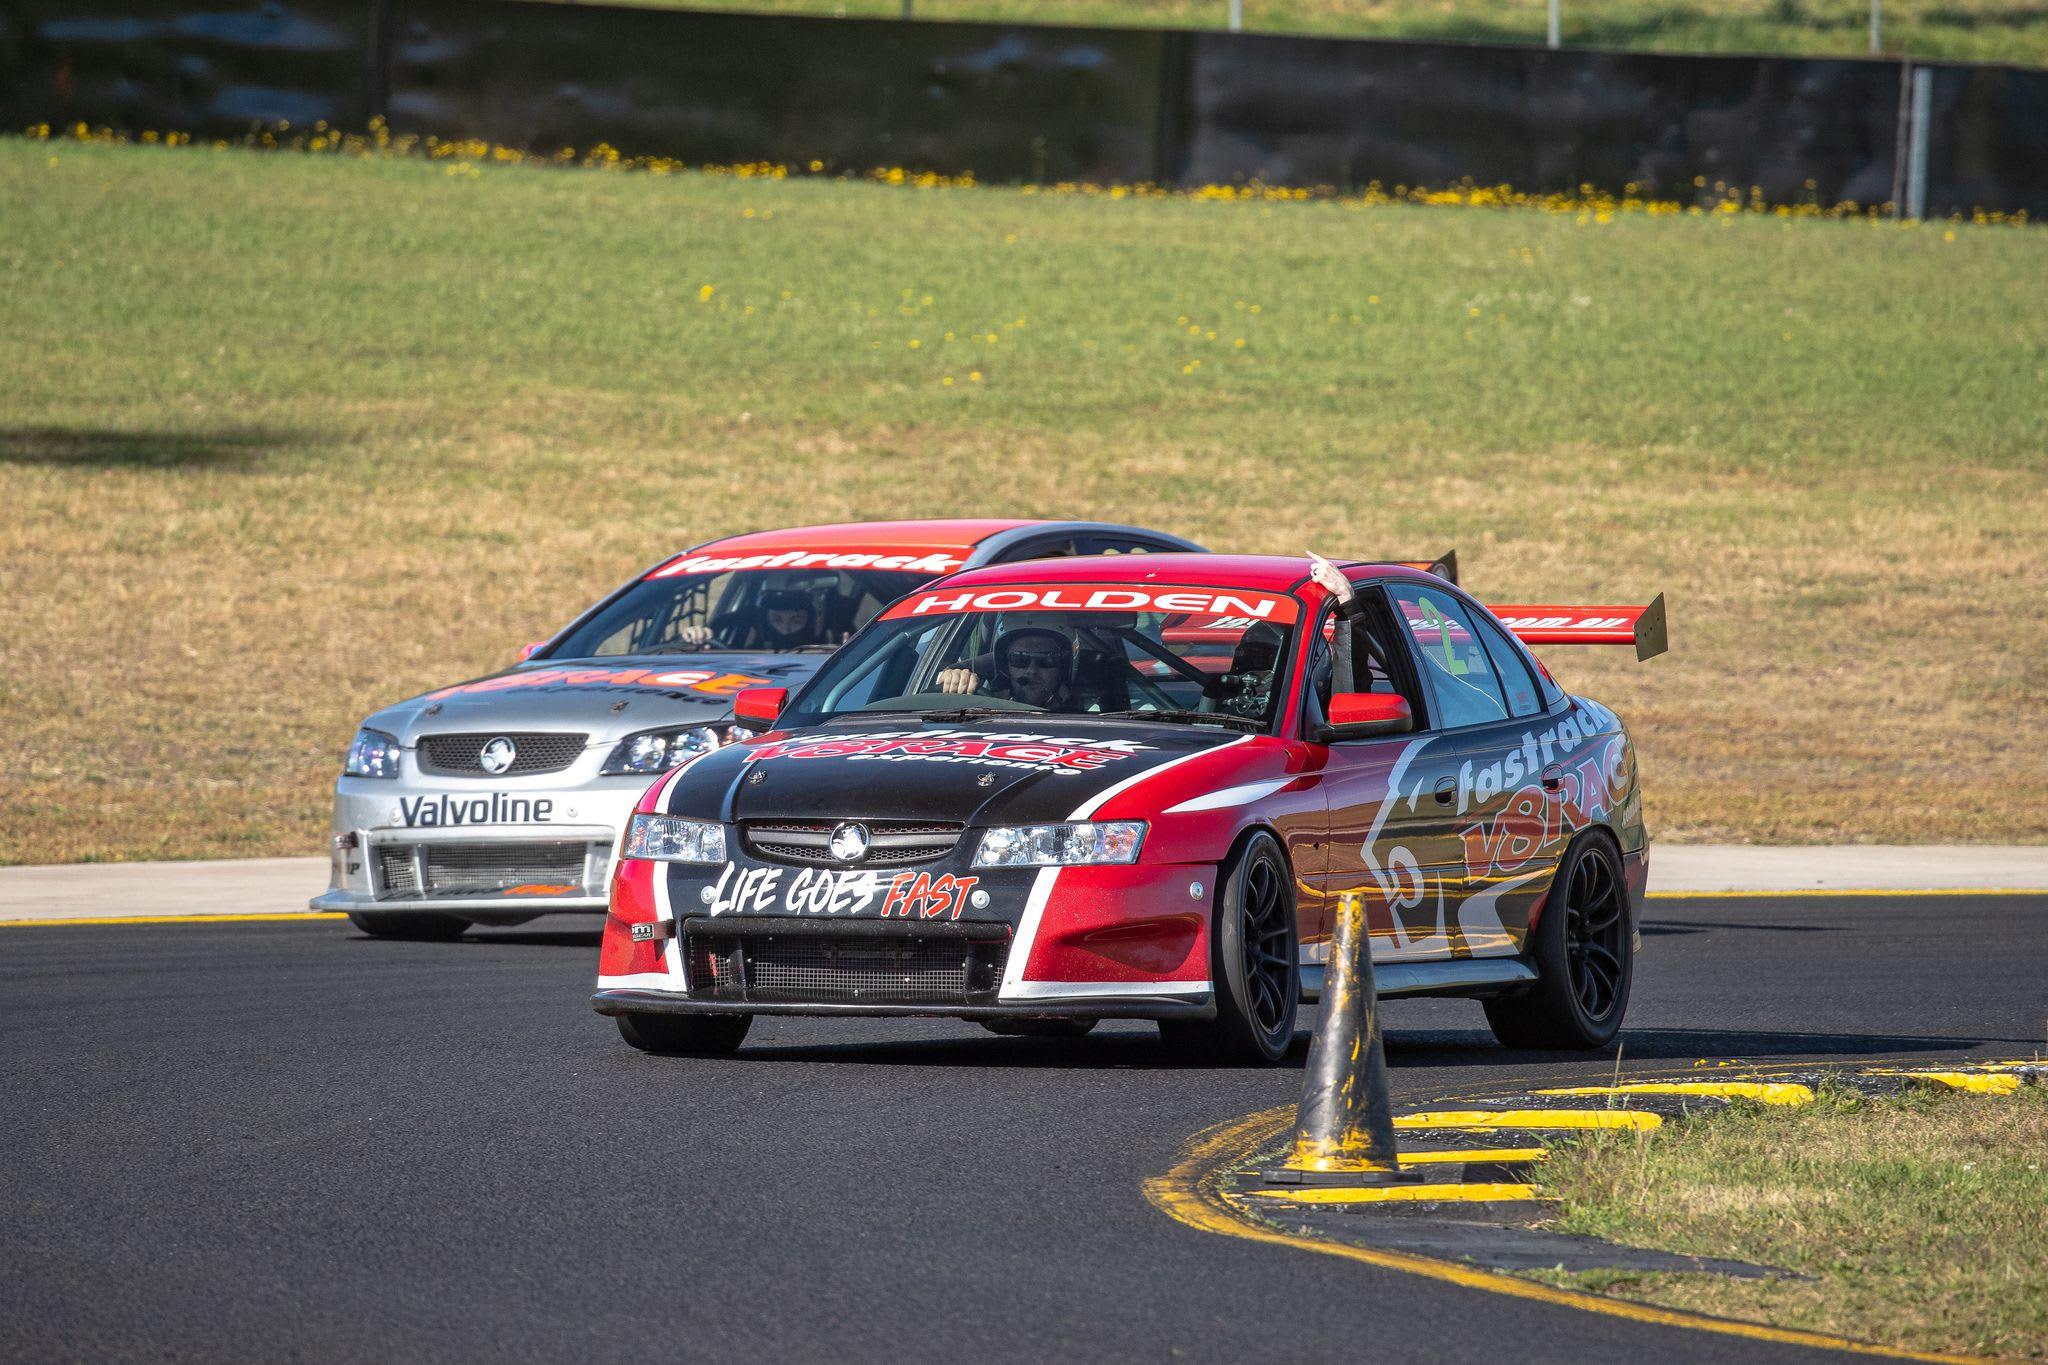 Bathurst Special Event: 2 V8 Race Car Hot Laps - Mount Panorama